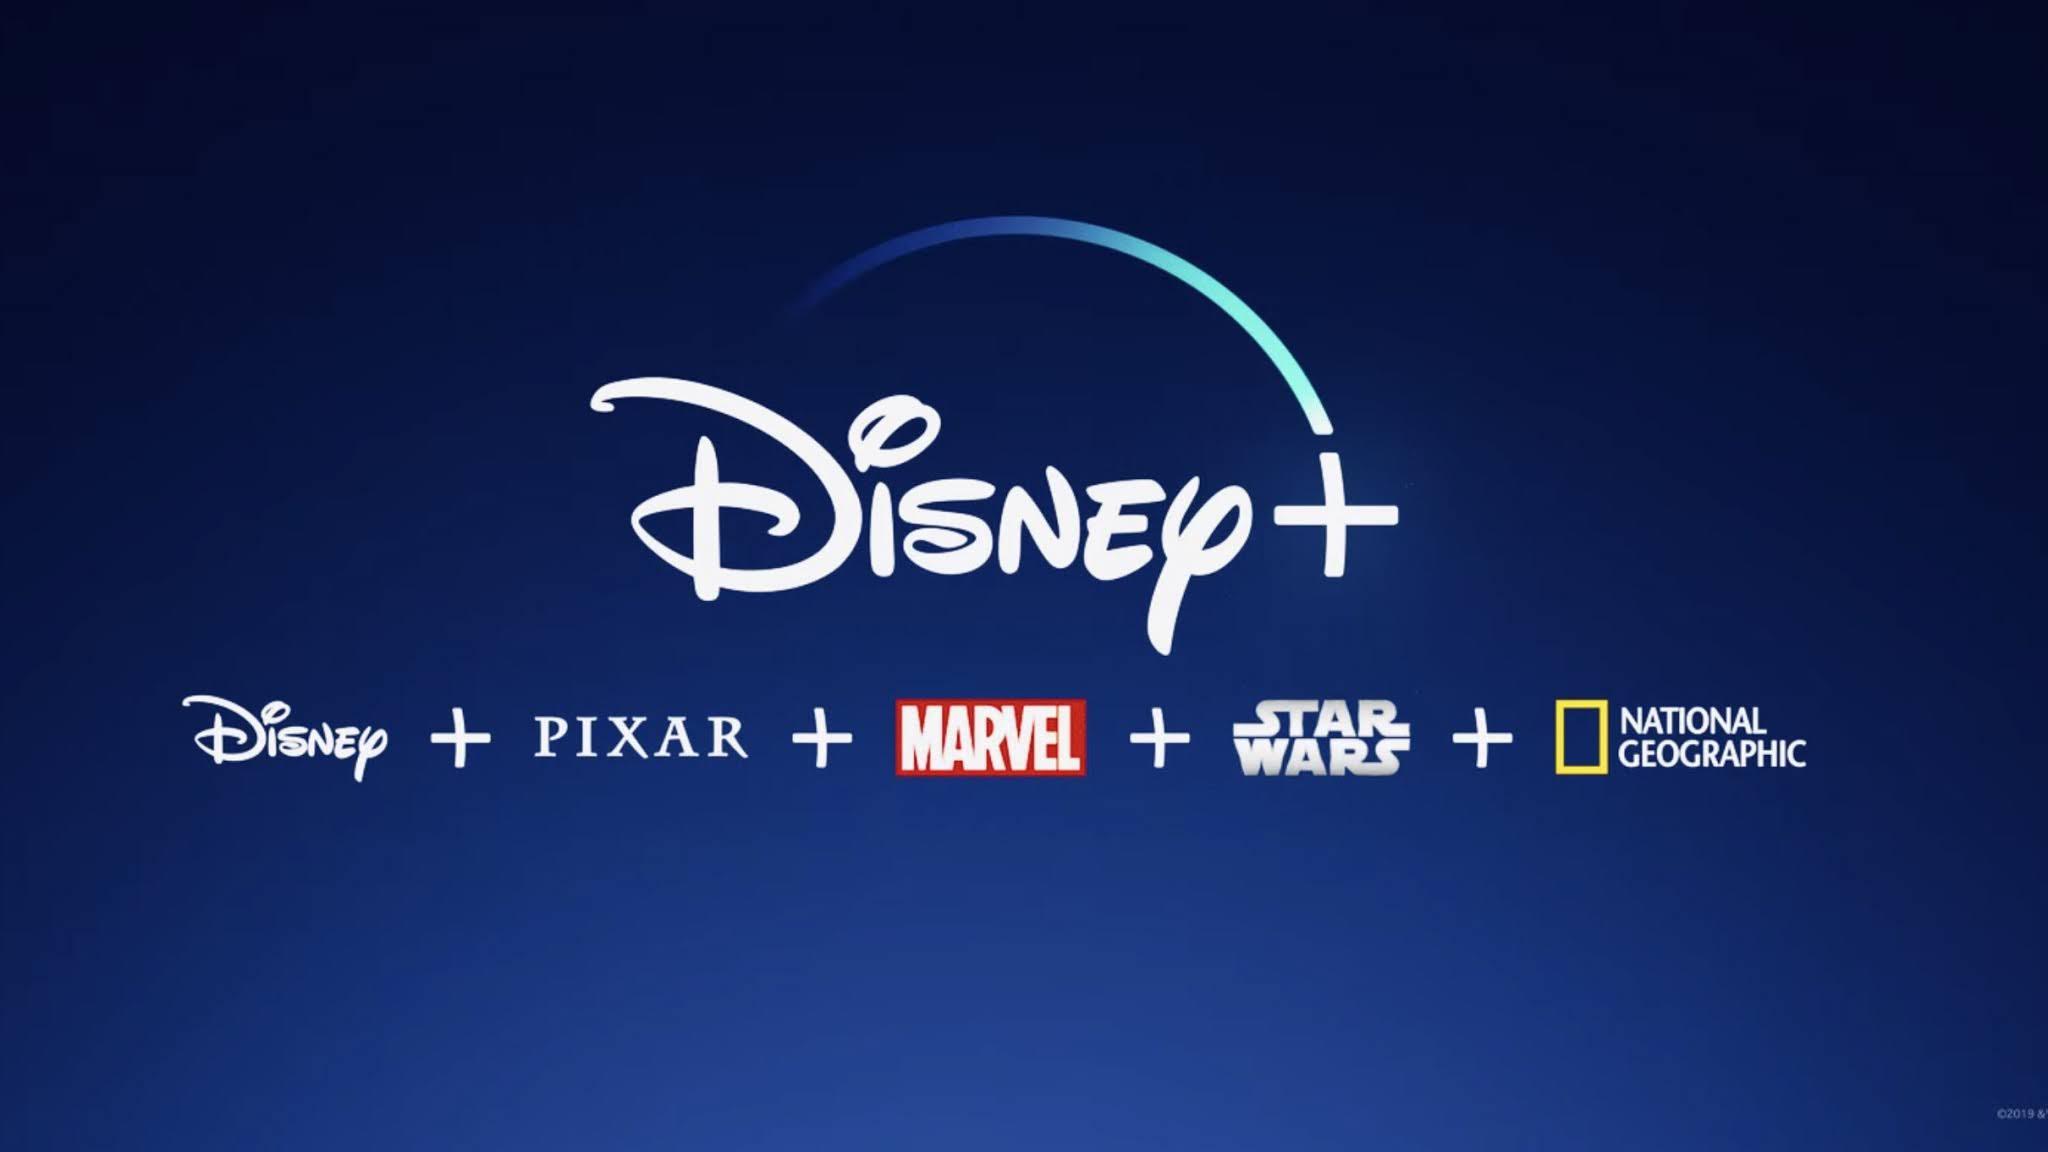 Mercado Libre te regala hasta 6 meses de Disney +